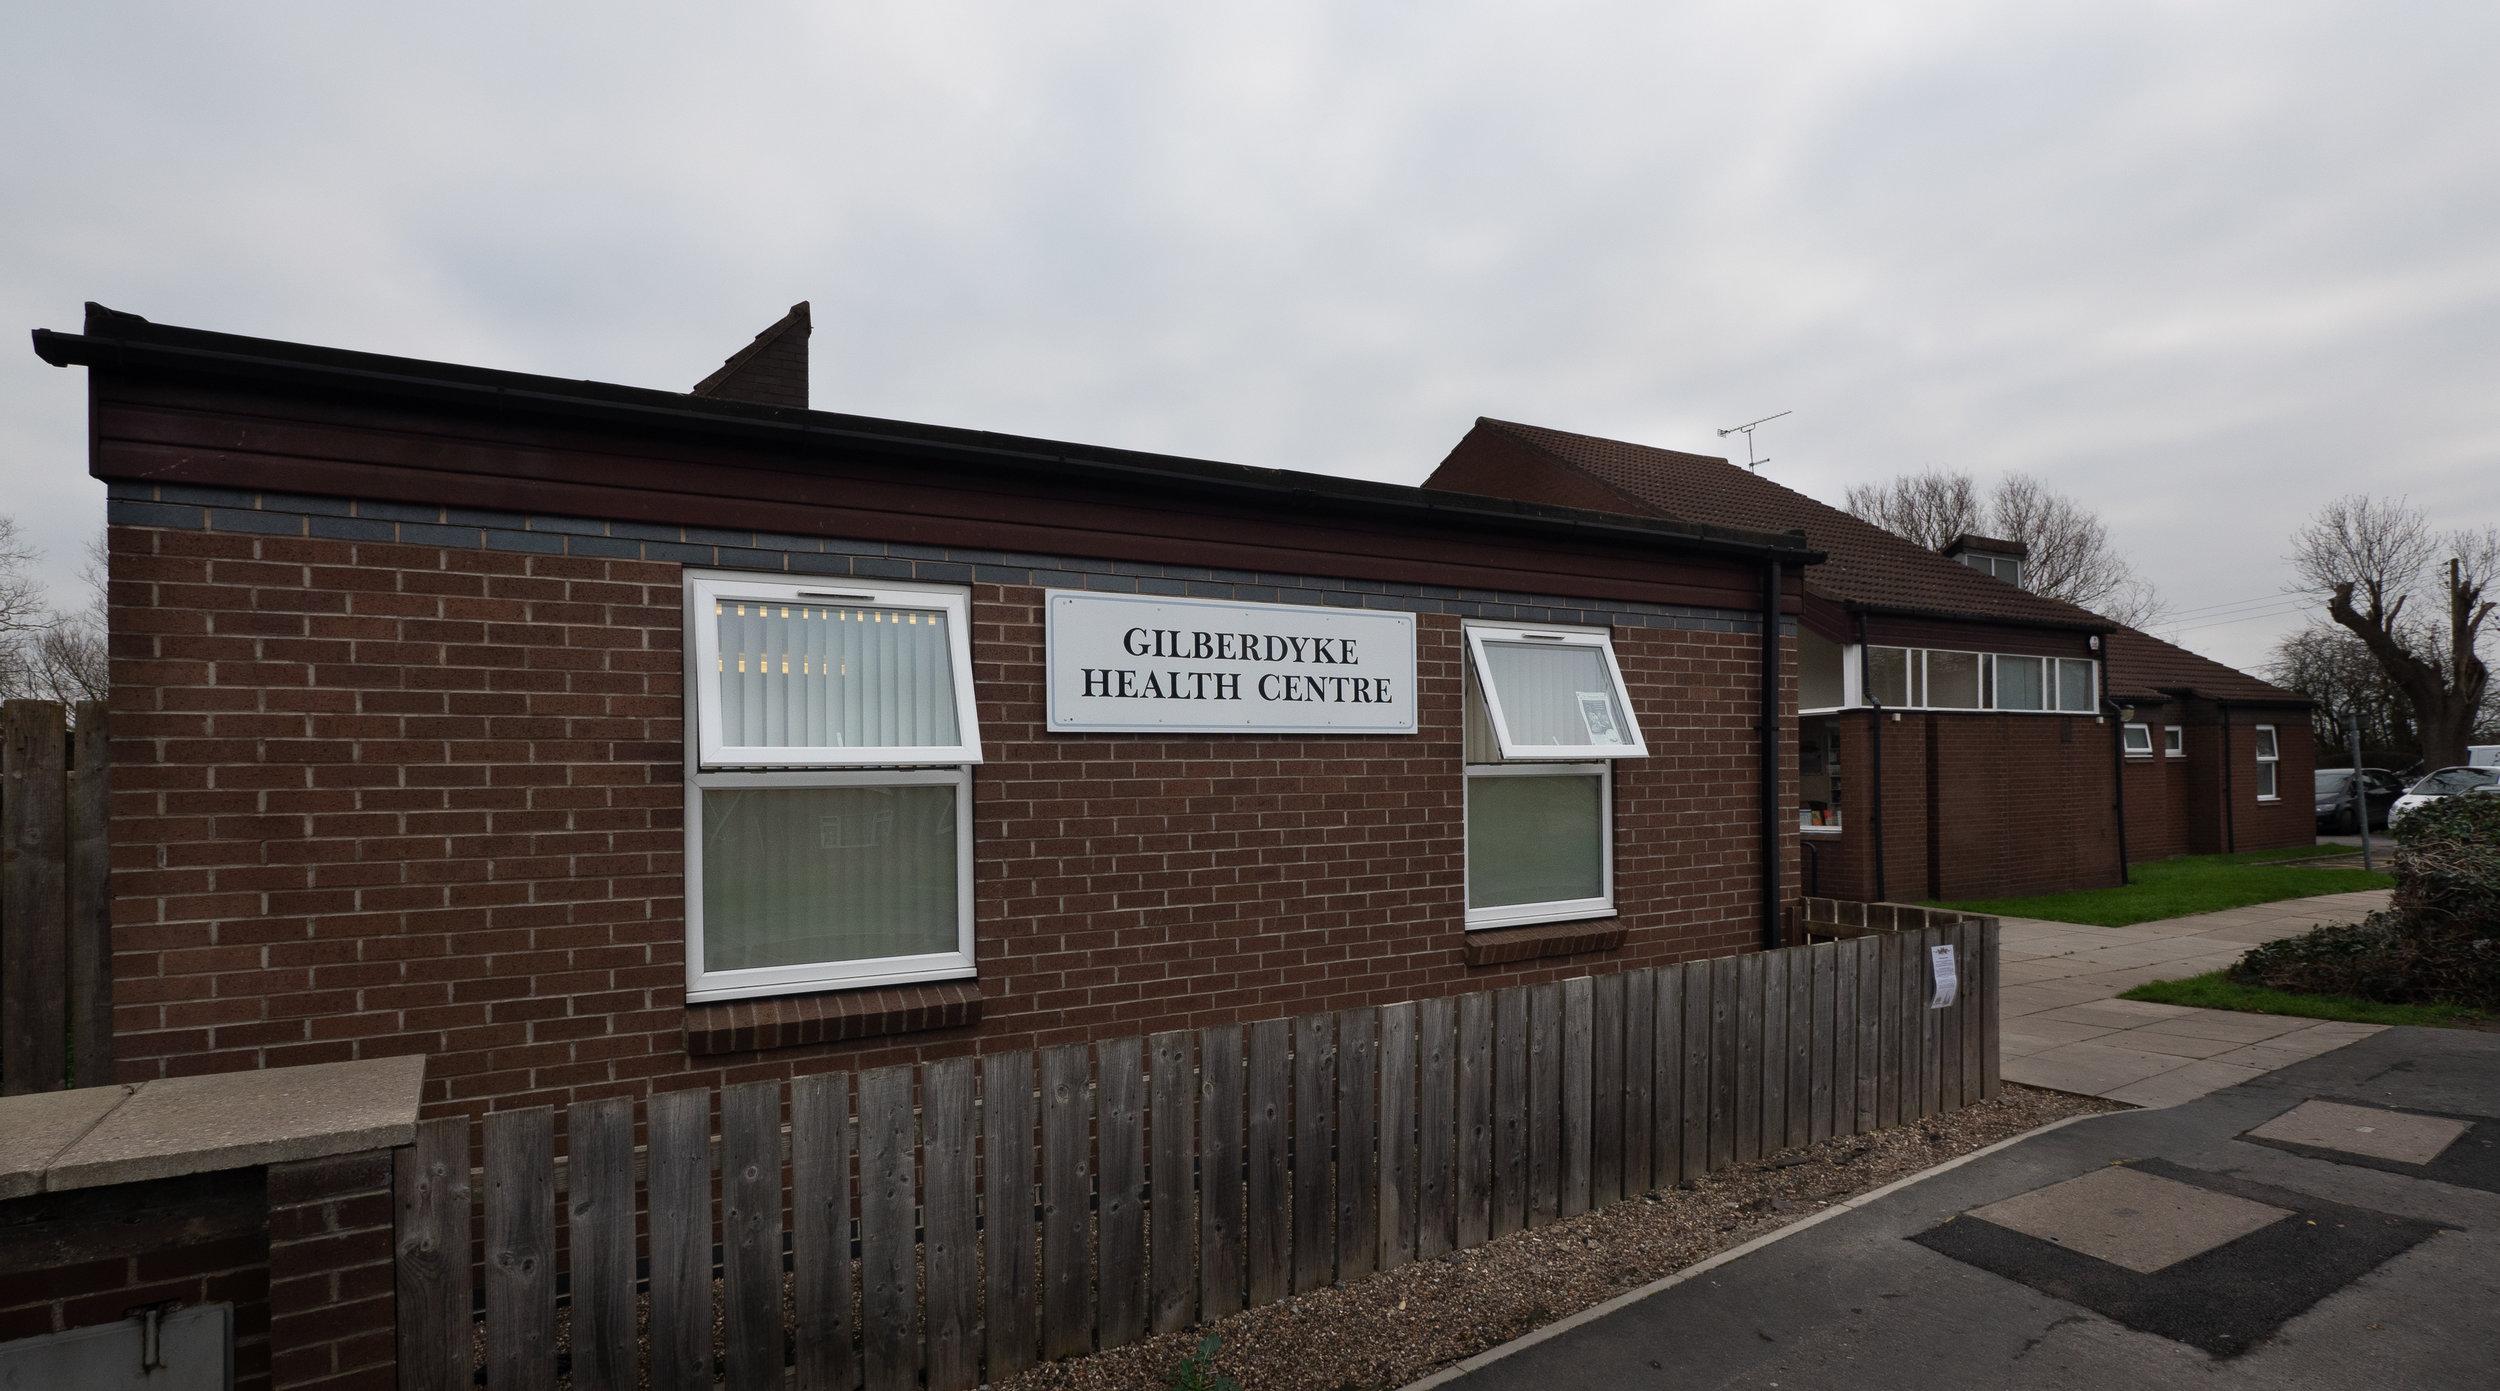 Gilberdyke Health Centre